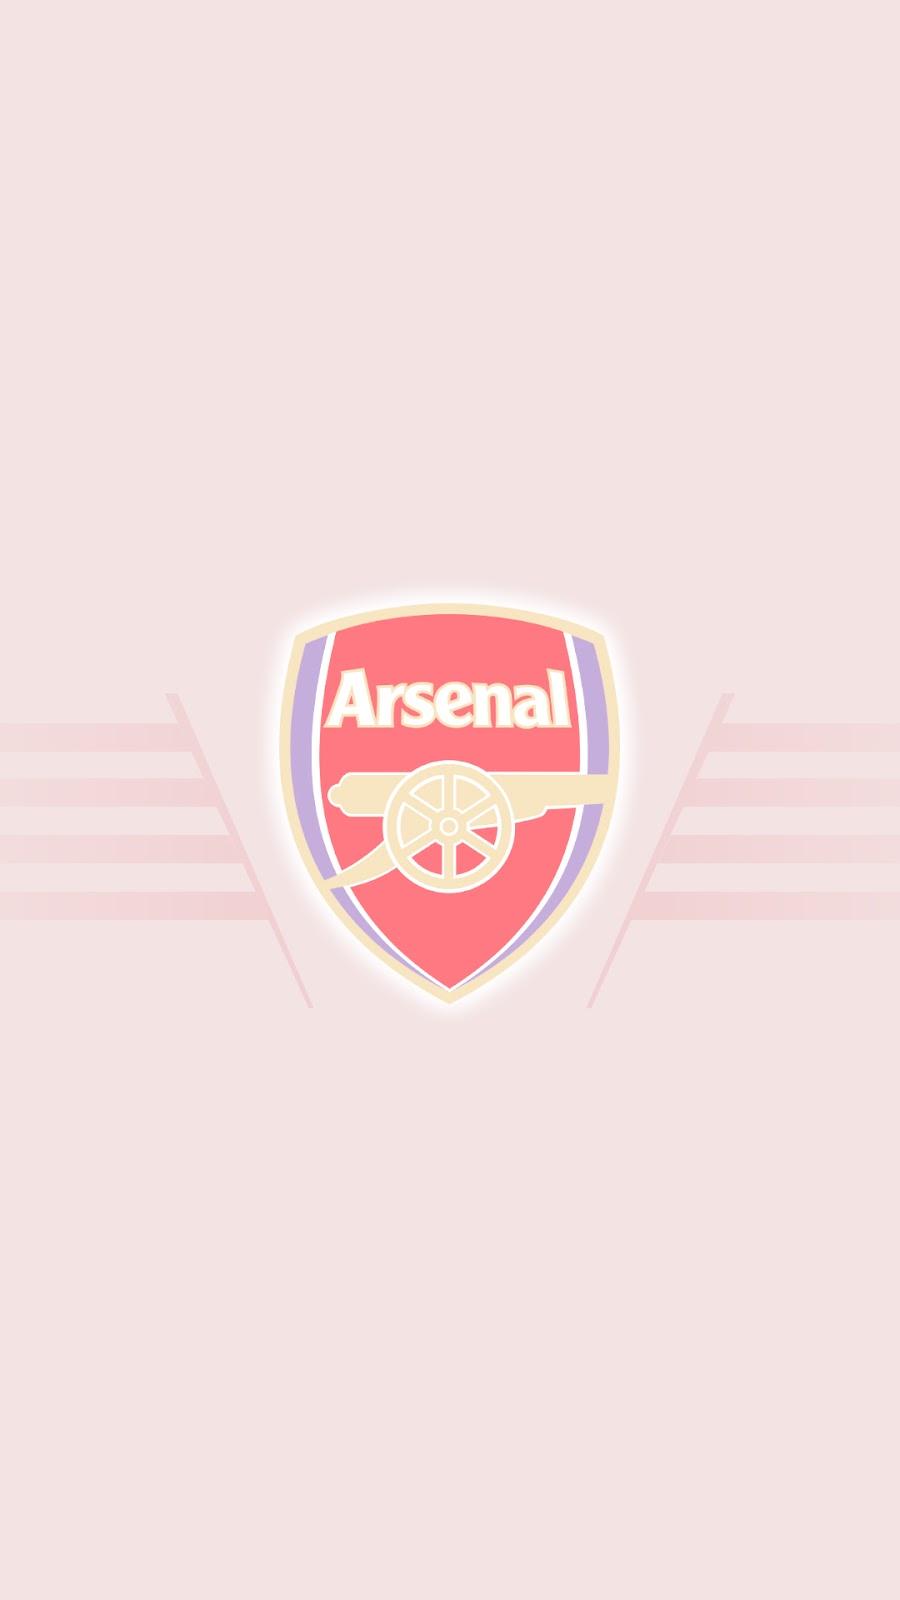 Wallpaper iphone arsenal - Arsenal Wallpapers Iphone 6s Plus